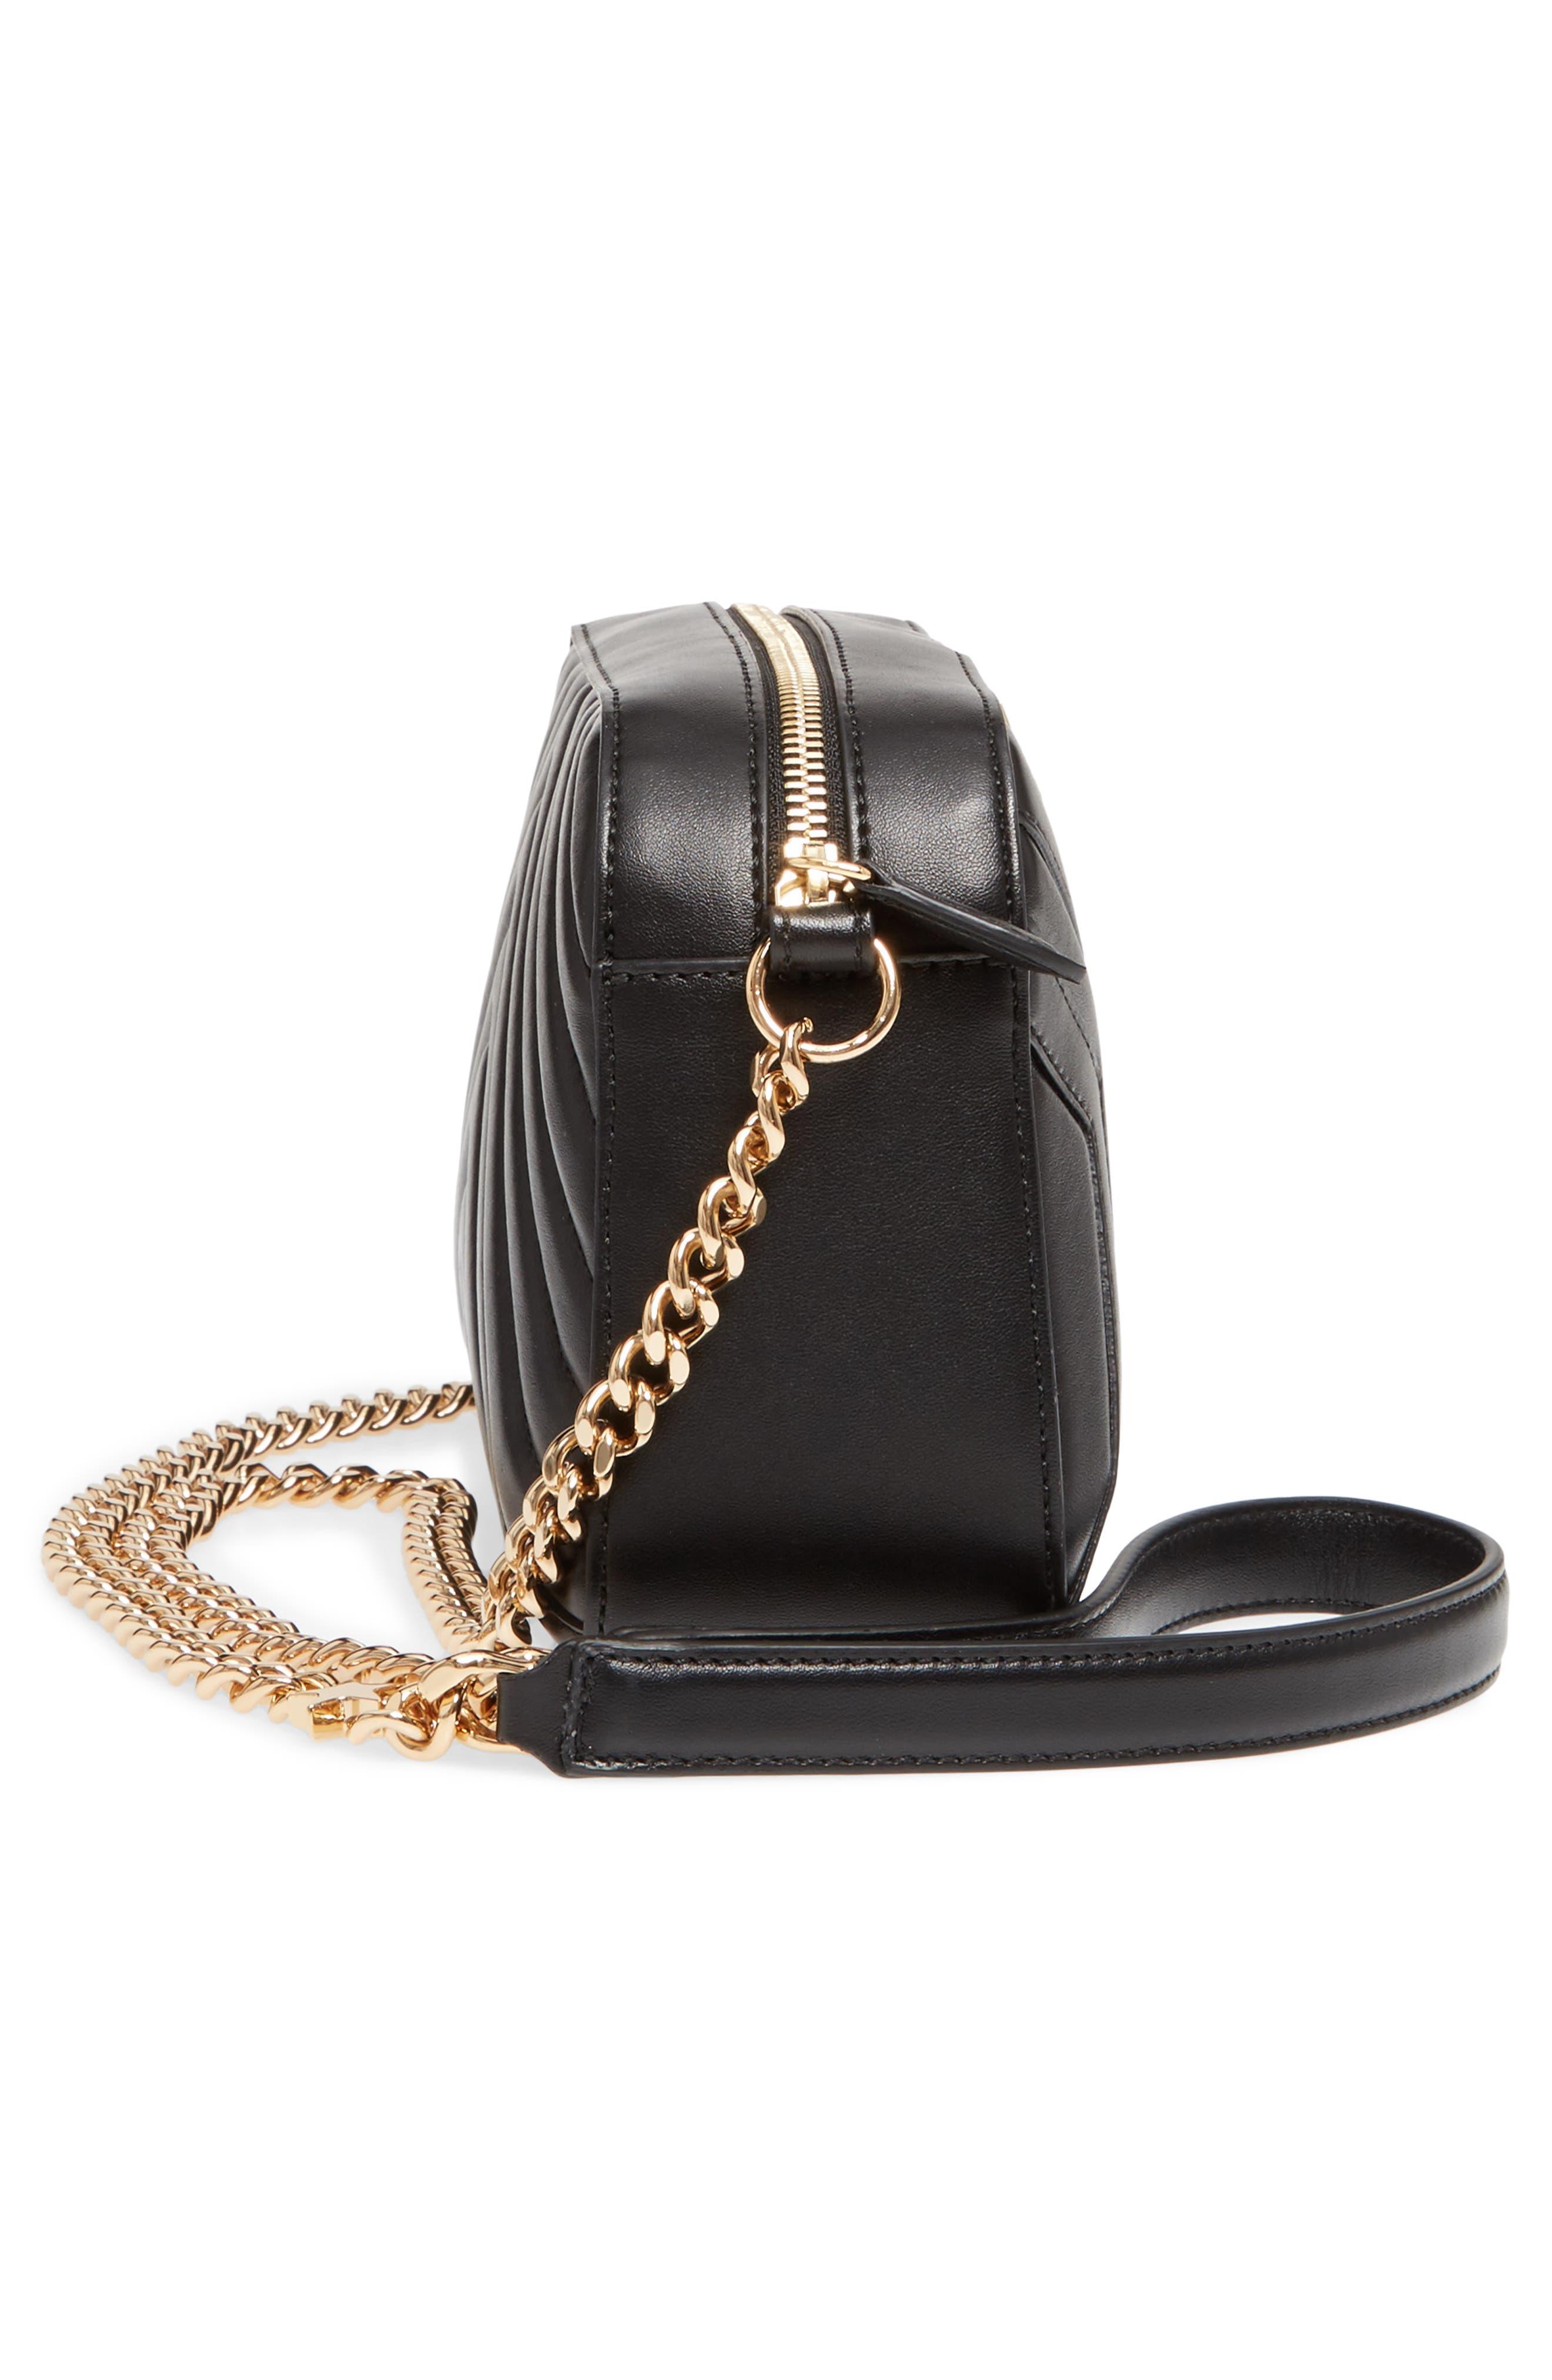 Alter Nappa Faux Leather Shoulder Bag,                             Alternate thumbnail 5, color,                             BLACK